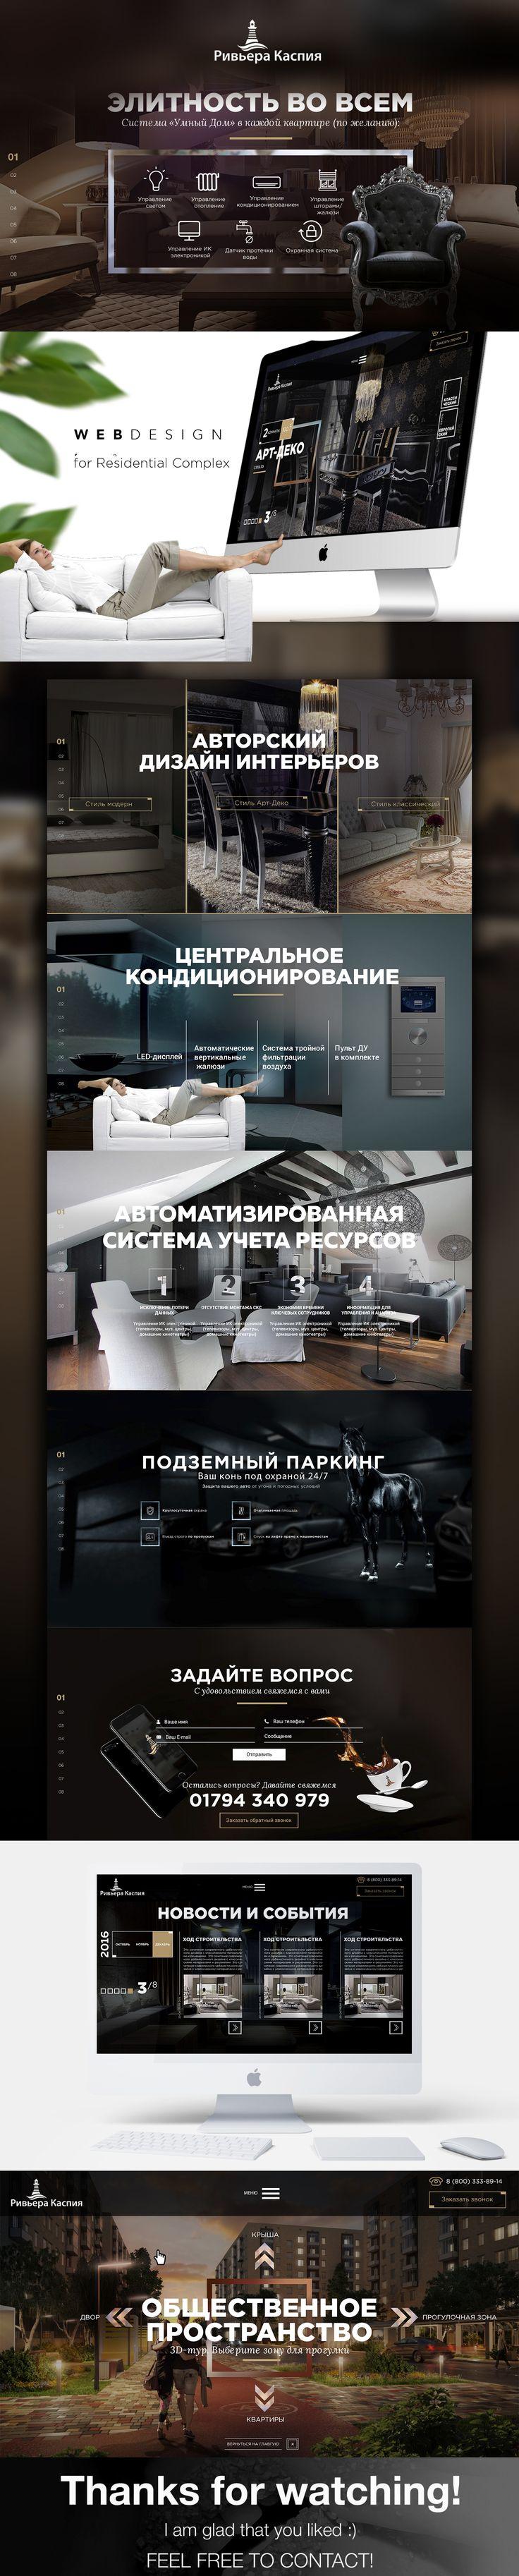 Natalia Logvinova on Behance